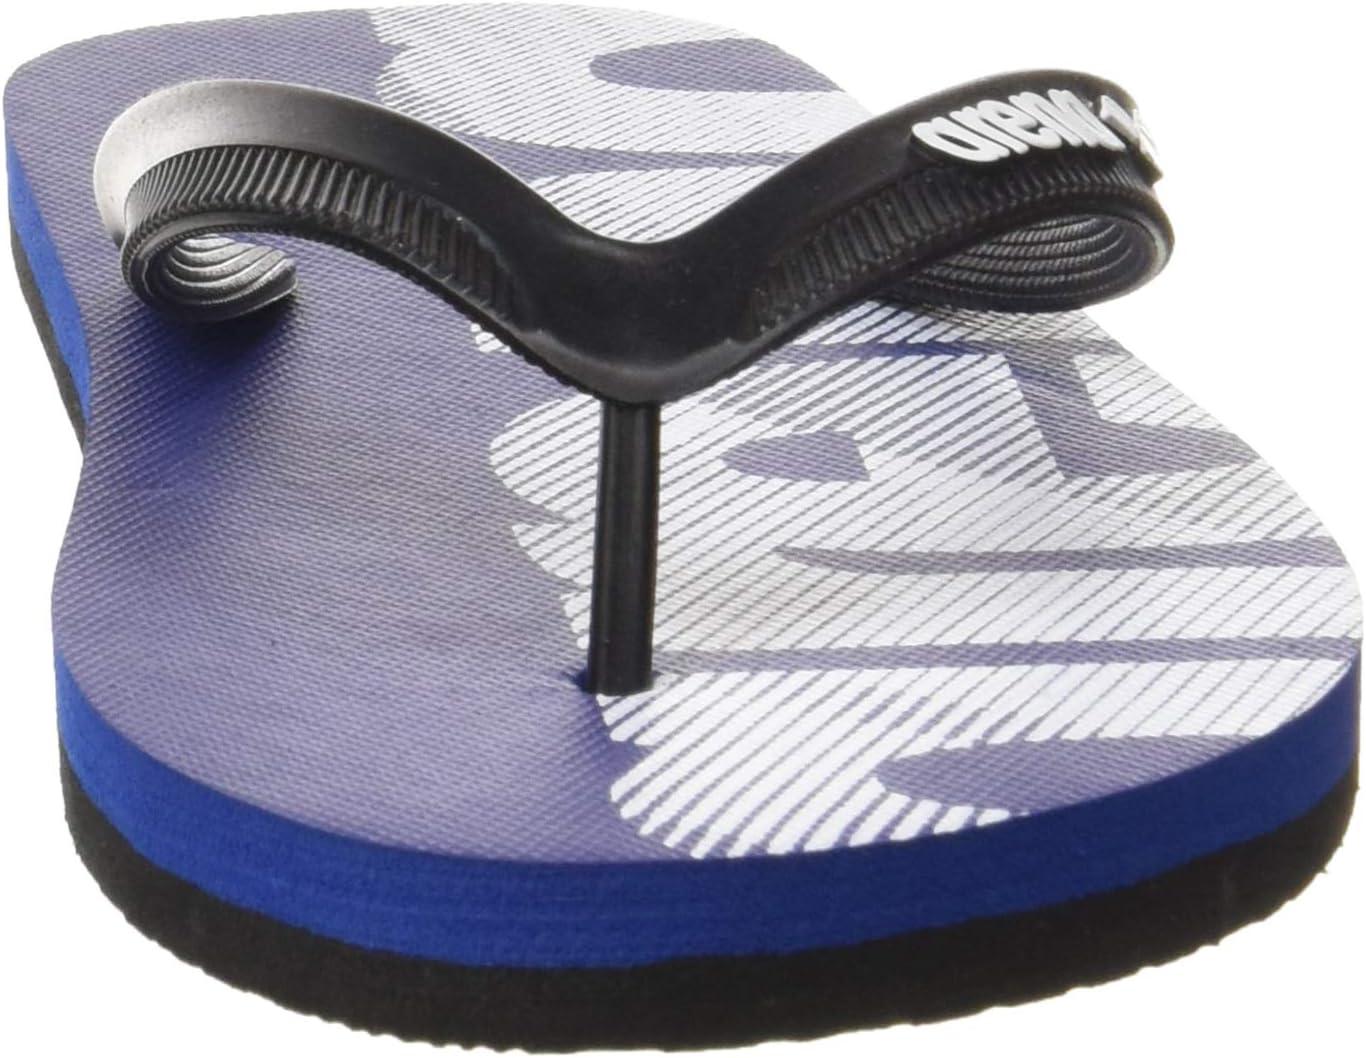 Sandales Mixte arena Arena Unisex Flip Flop